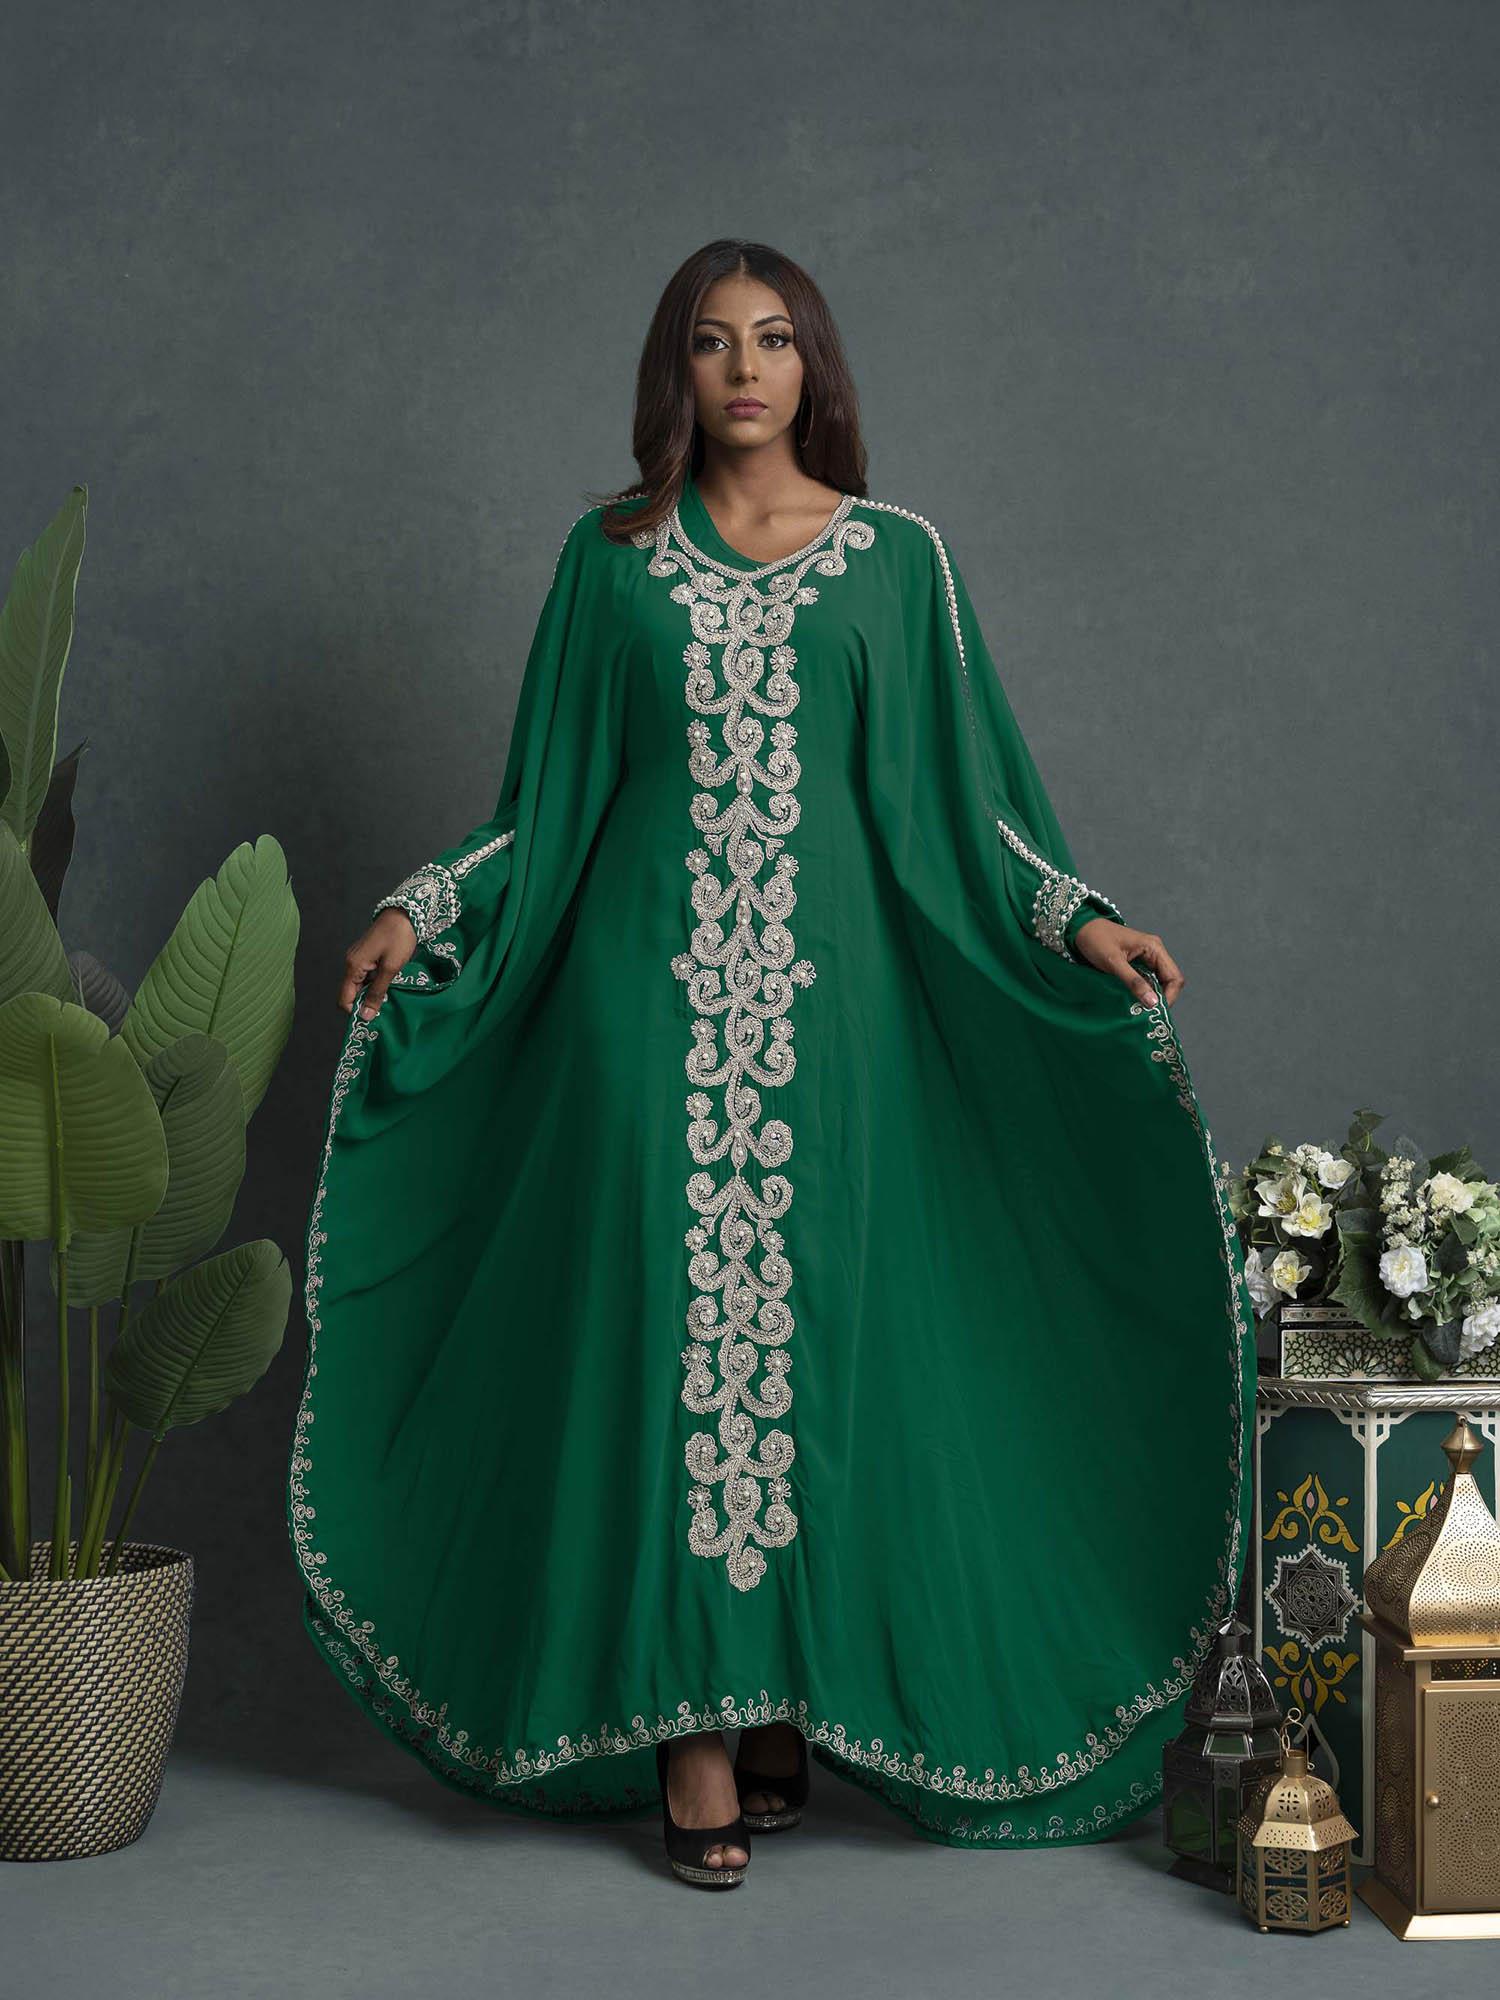 Fashion Photography Maghrebi Clothing Singapore Product Photographer COCO Creative Studio 4